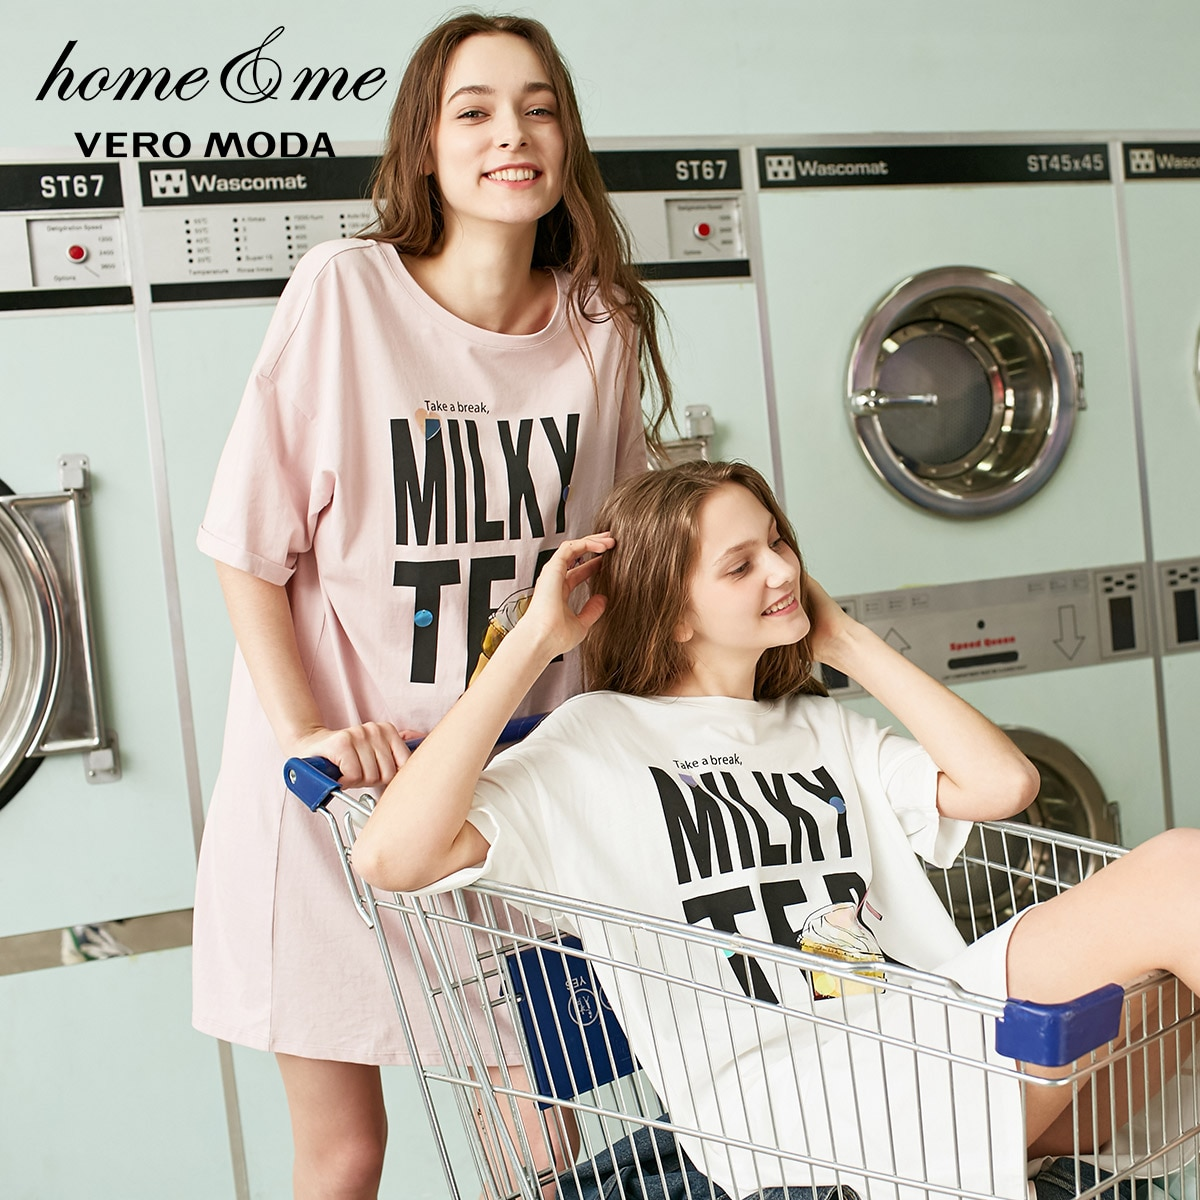 Vero Moda חדש תוספות סגנון נשים של 100% כותנה מכתב הדפסת Paillette חולצה שמלת   319161524